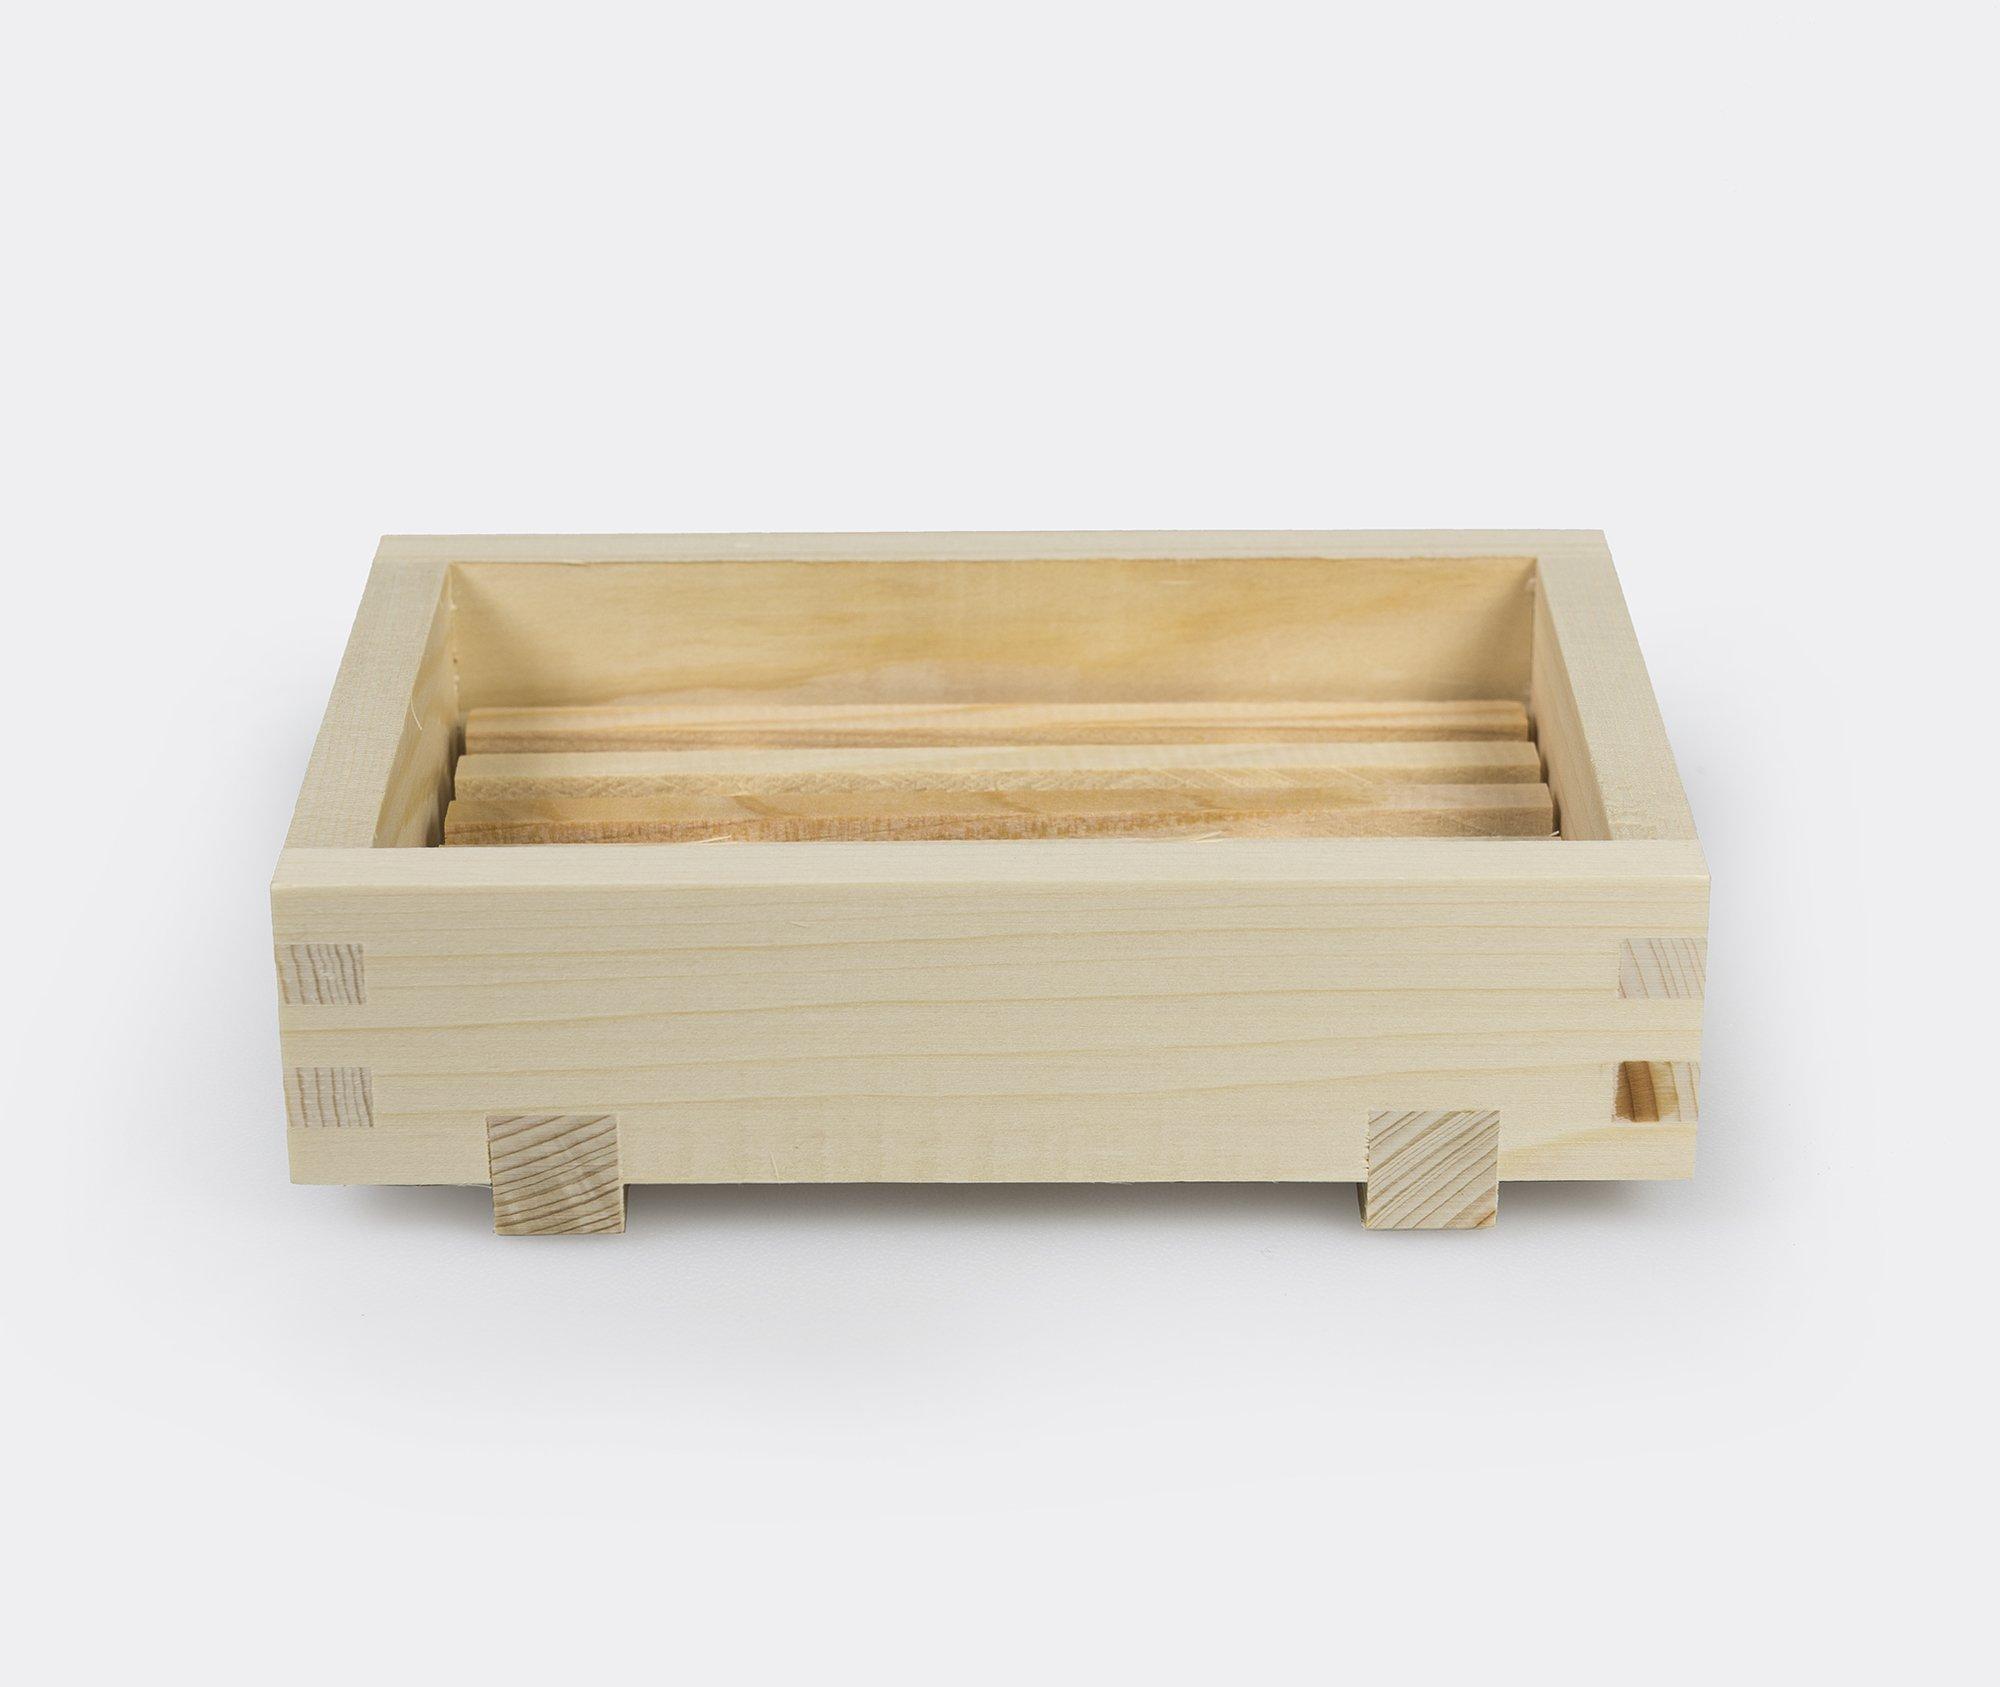 Yamashita Kogei Hinoki Cypress Wooden Soap Dish - Japanese Onsen Hot-Spring Style Tray